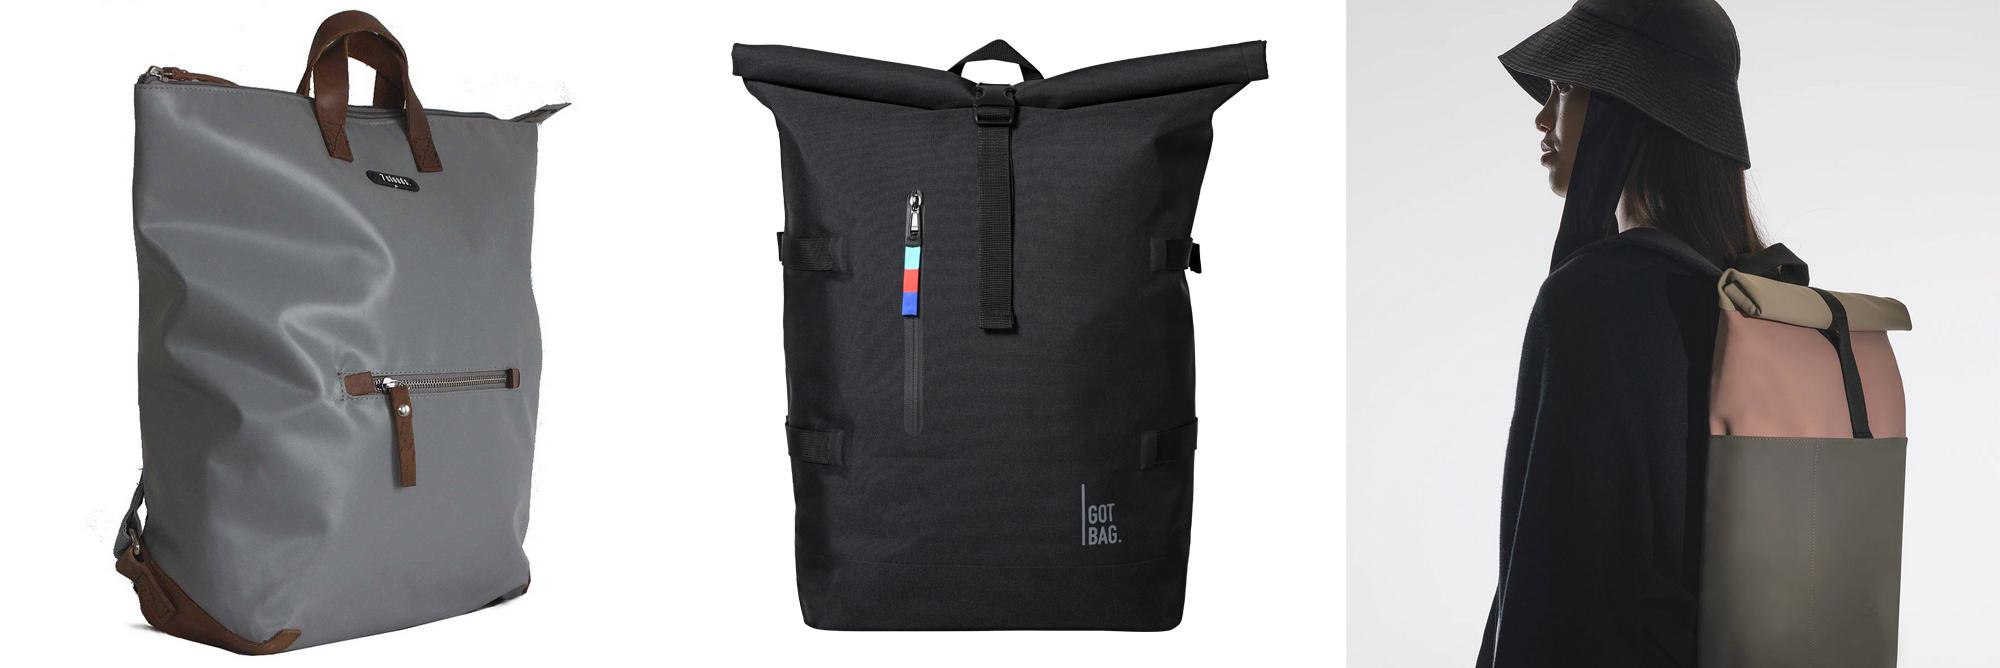 Fair Couture – Bags & Backpacks